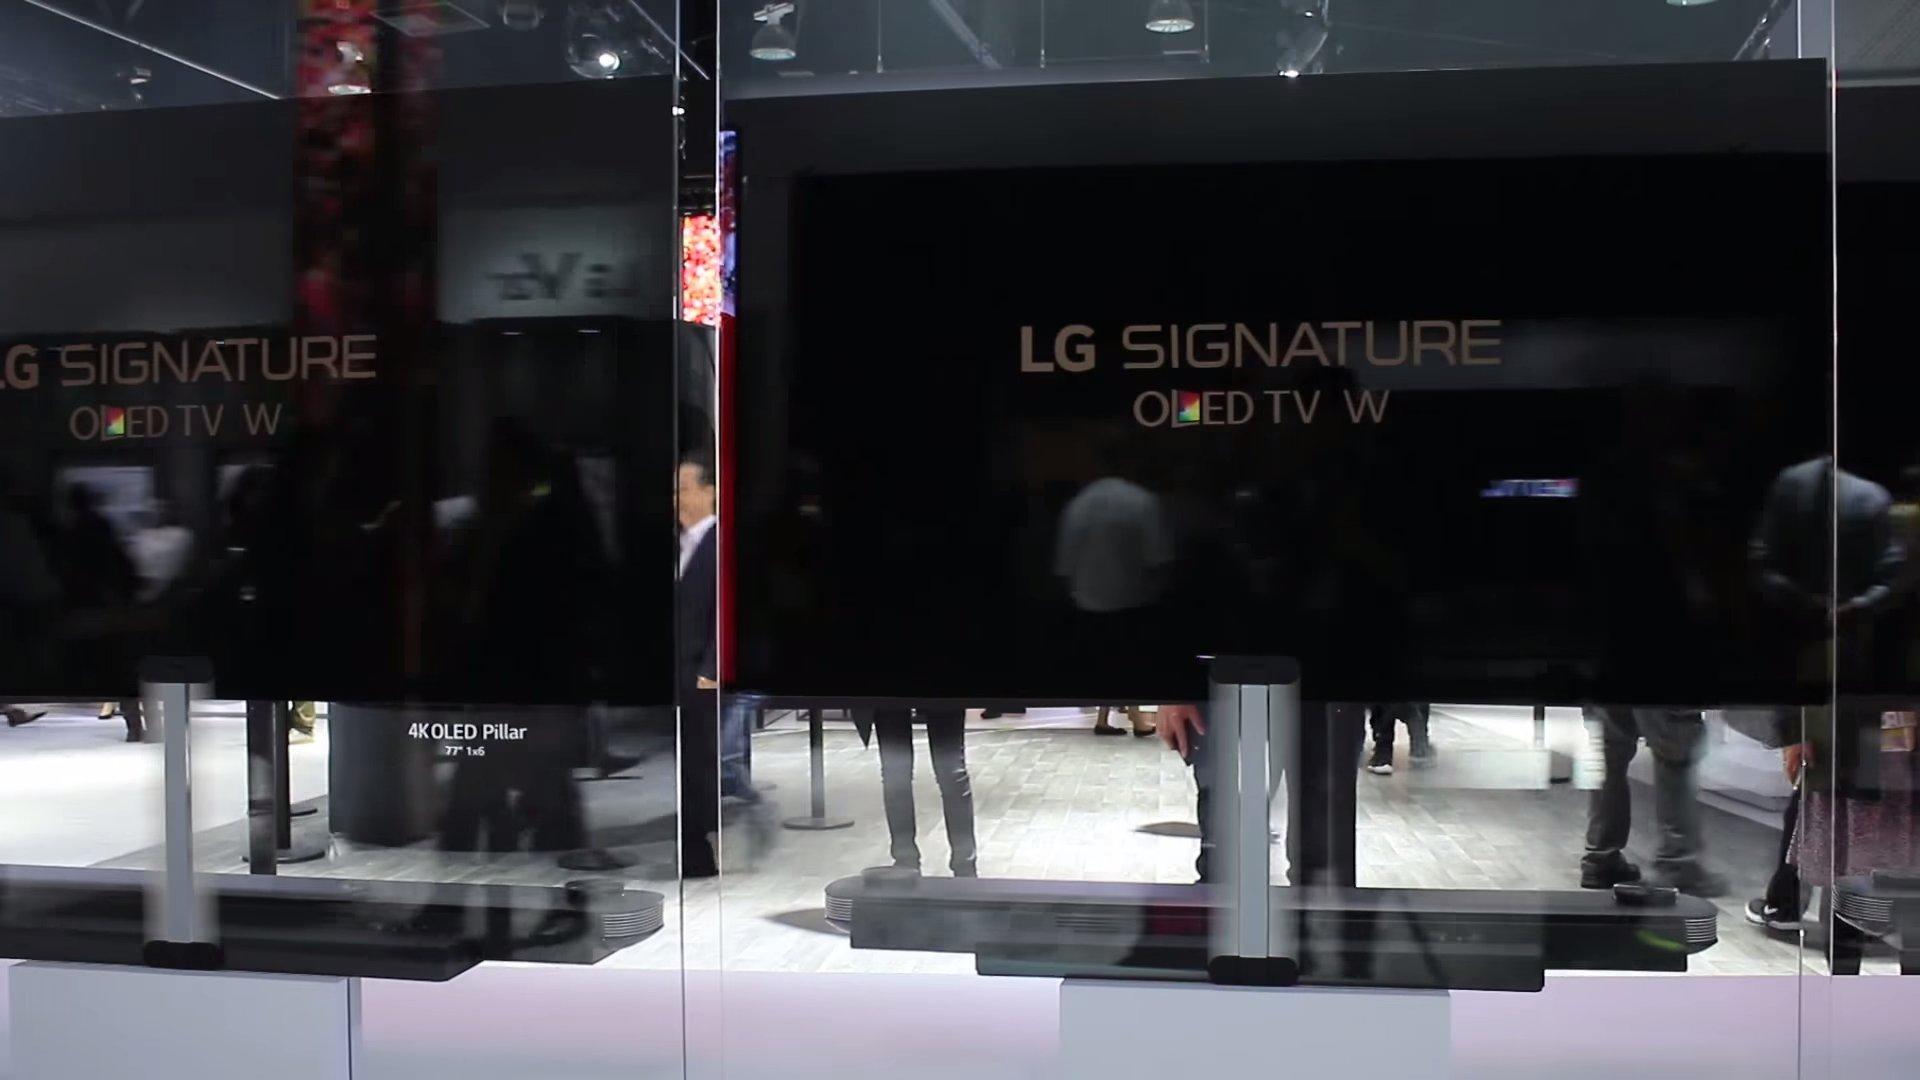 LG Signature W OLED